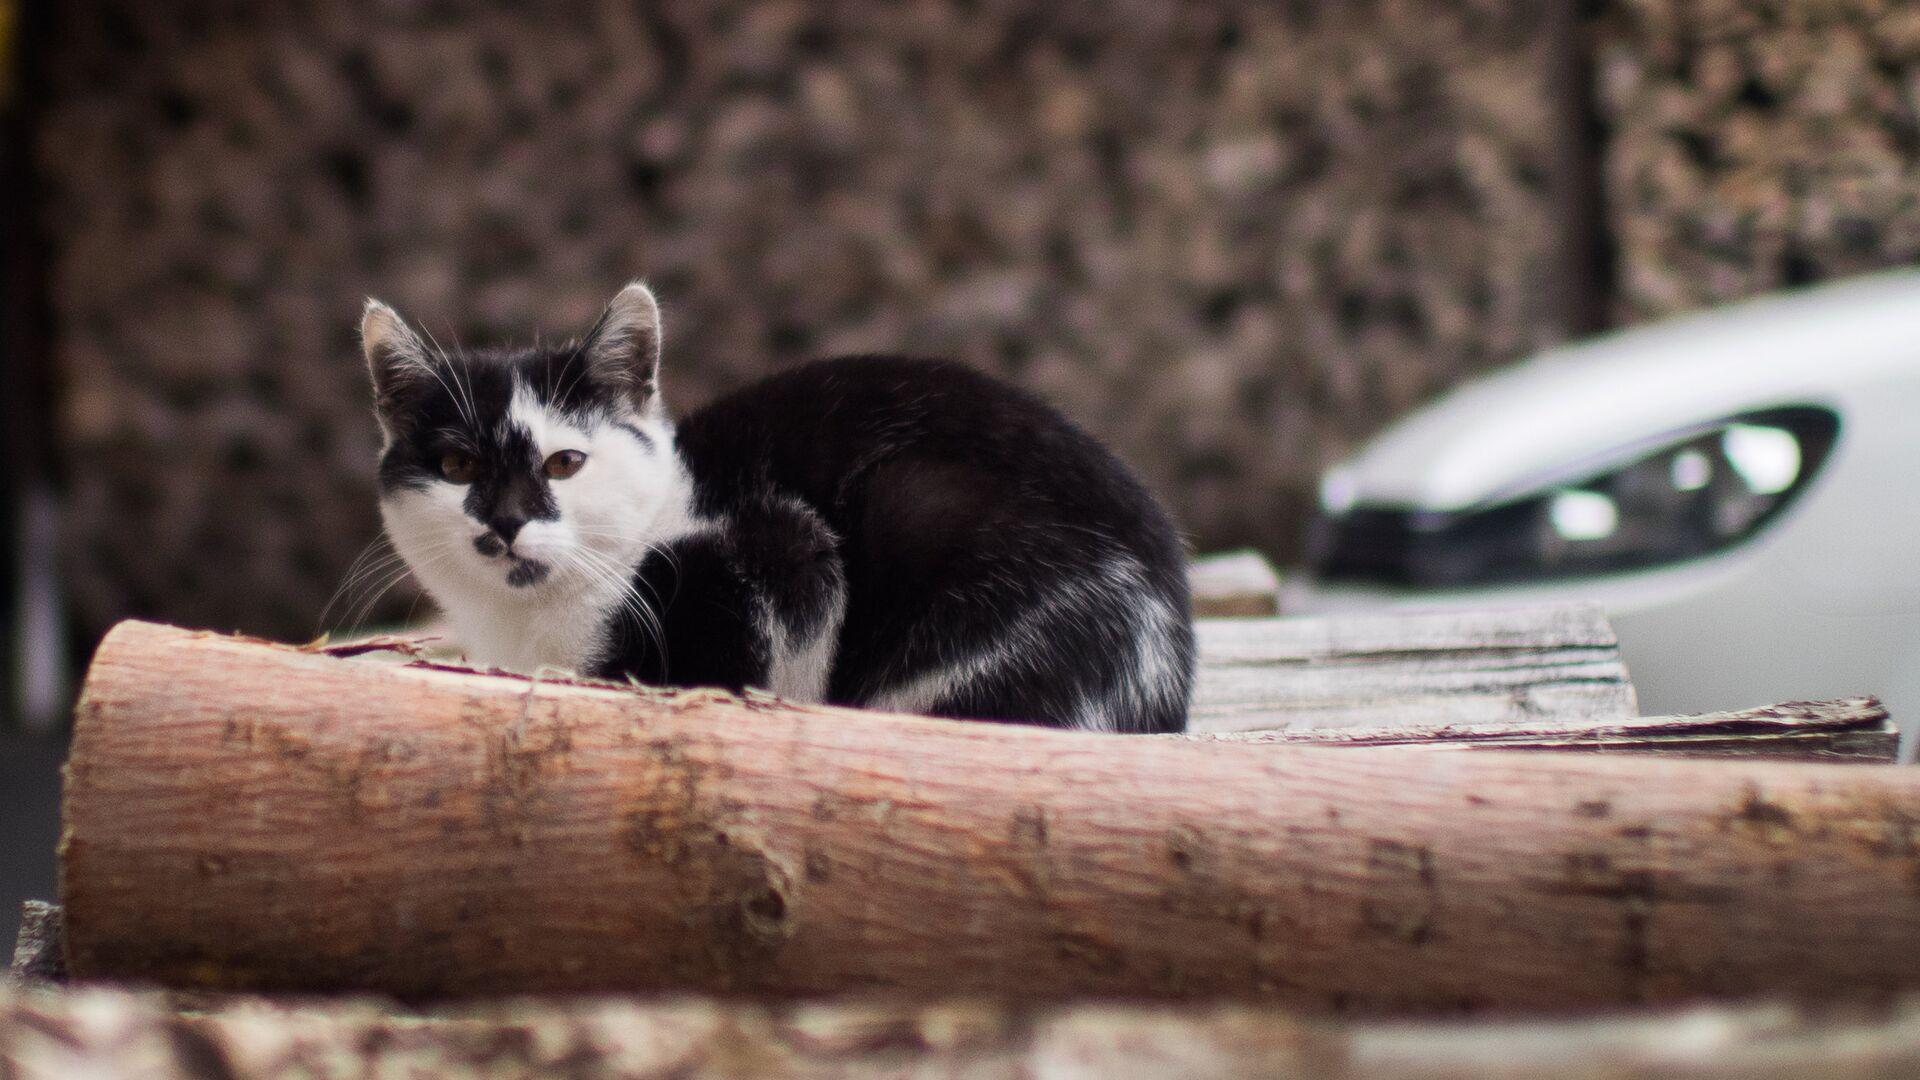 Кошка на территории биоотеля - РИА Новости, 1920, 02.10.2020